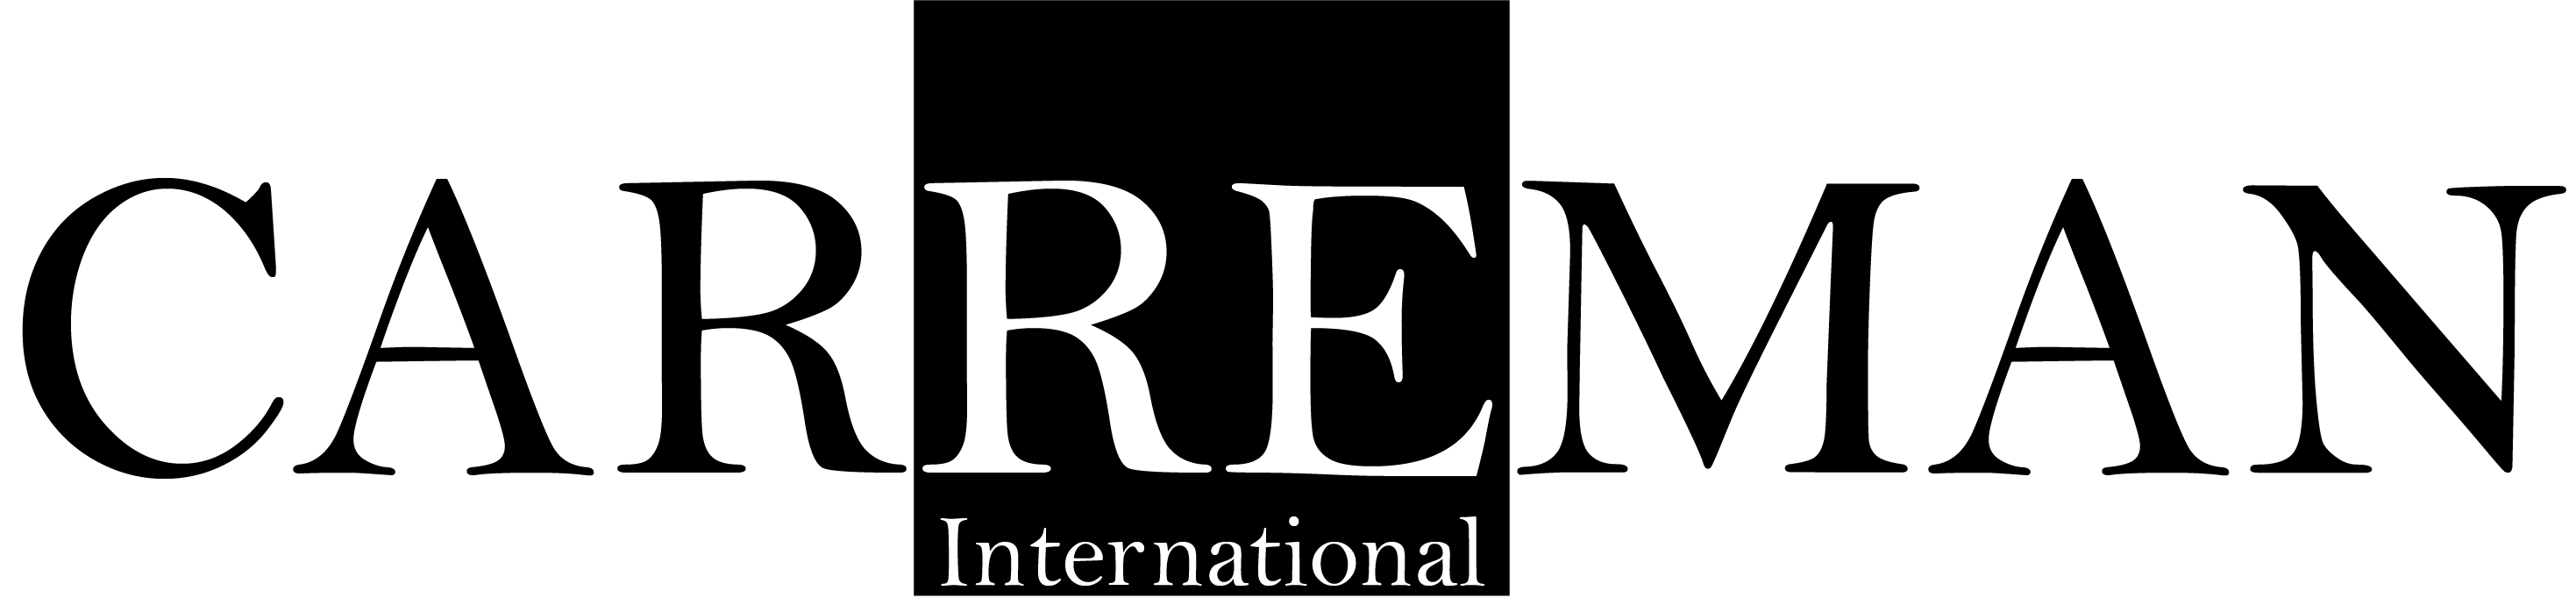 Carreman International